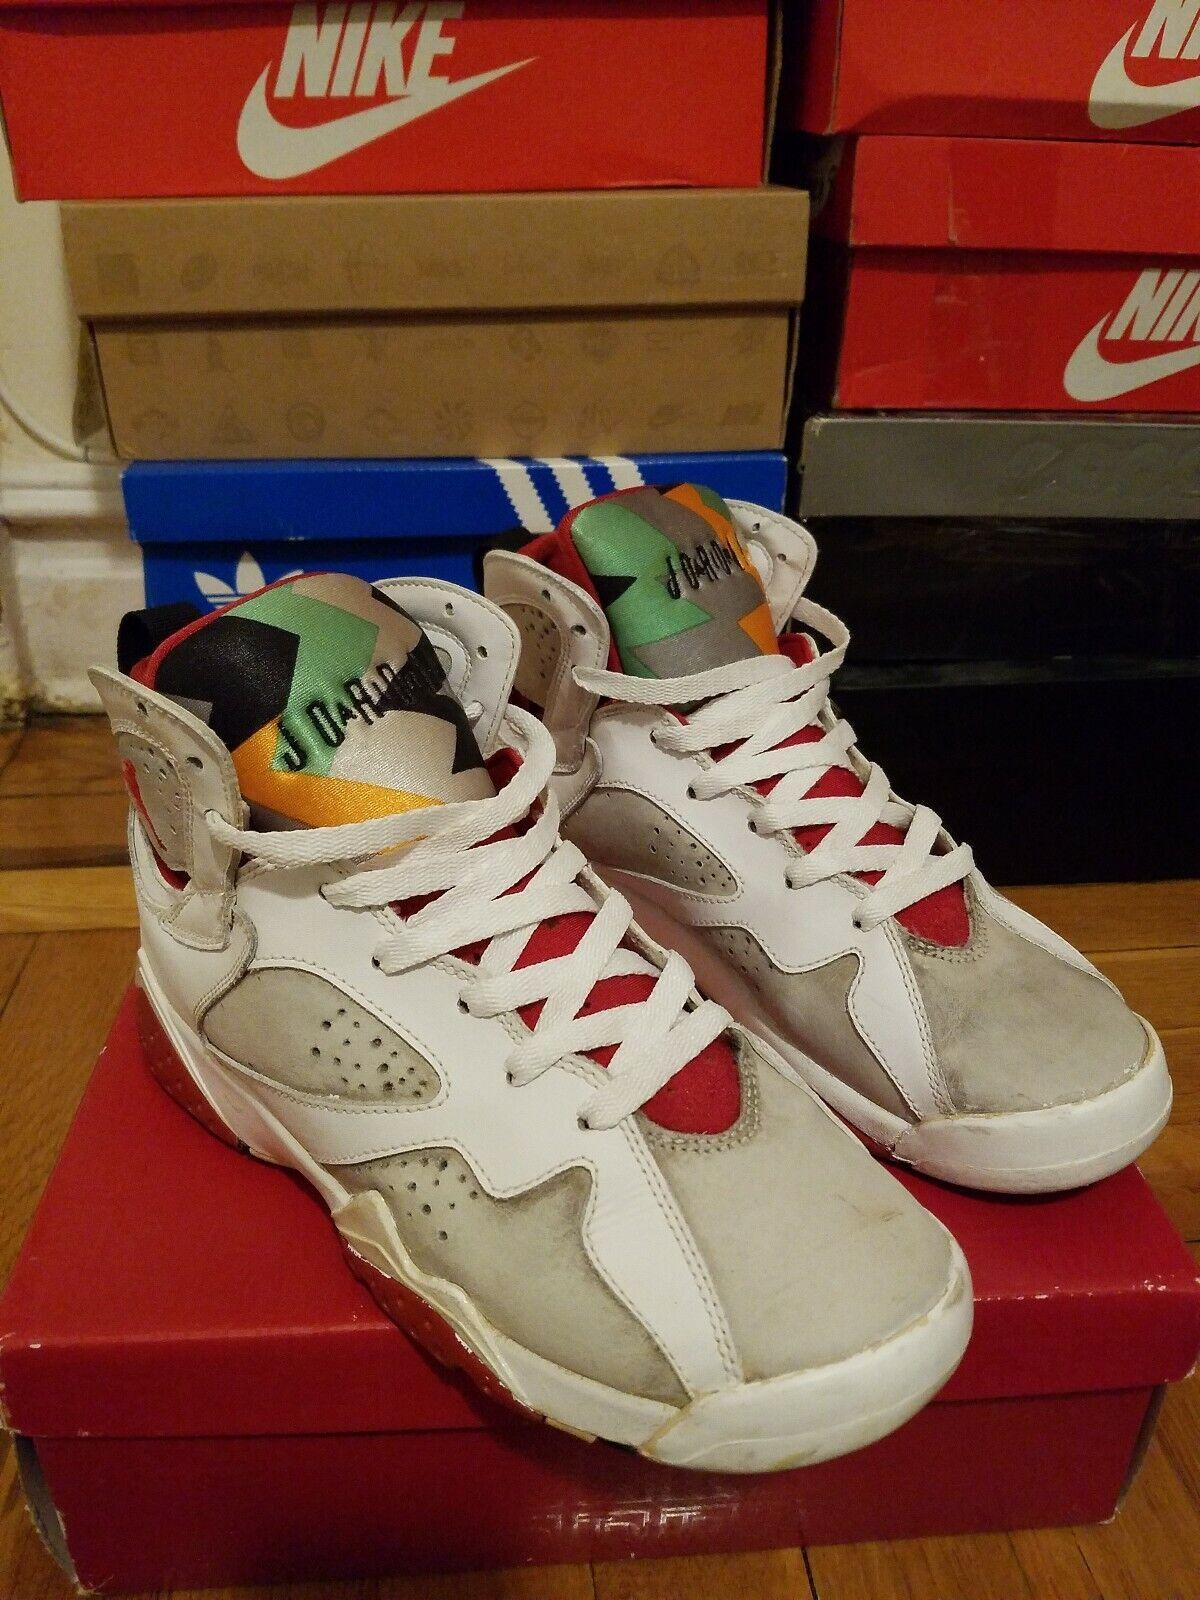 43d77b1a30919e Nike Air Jordan Vii 7 Hare Cdp Dountdown Pack Size 6y Youth Kids